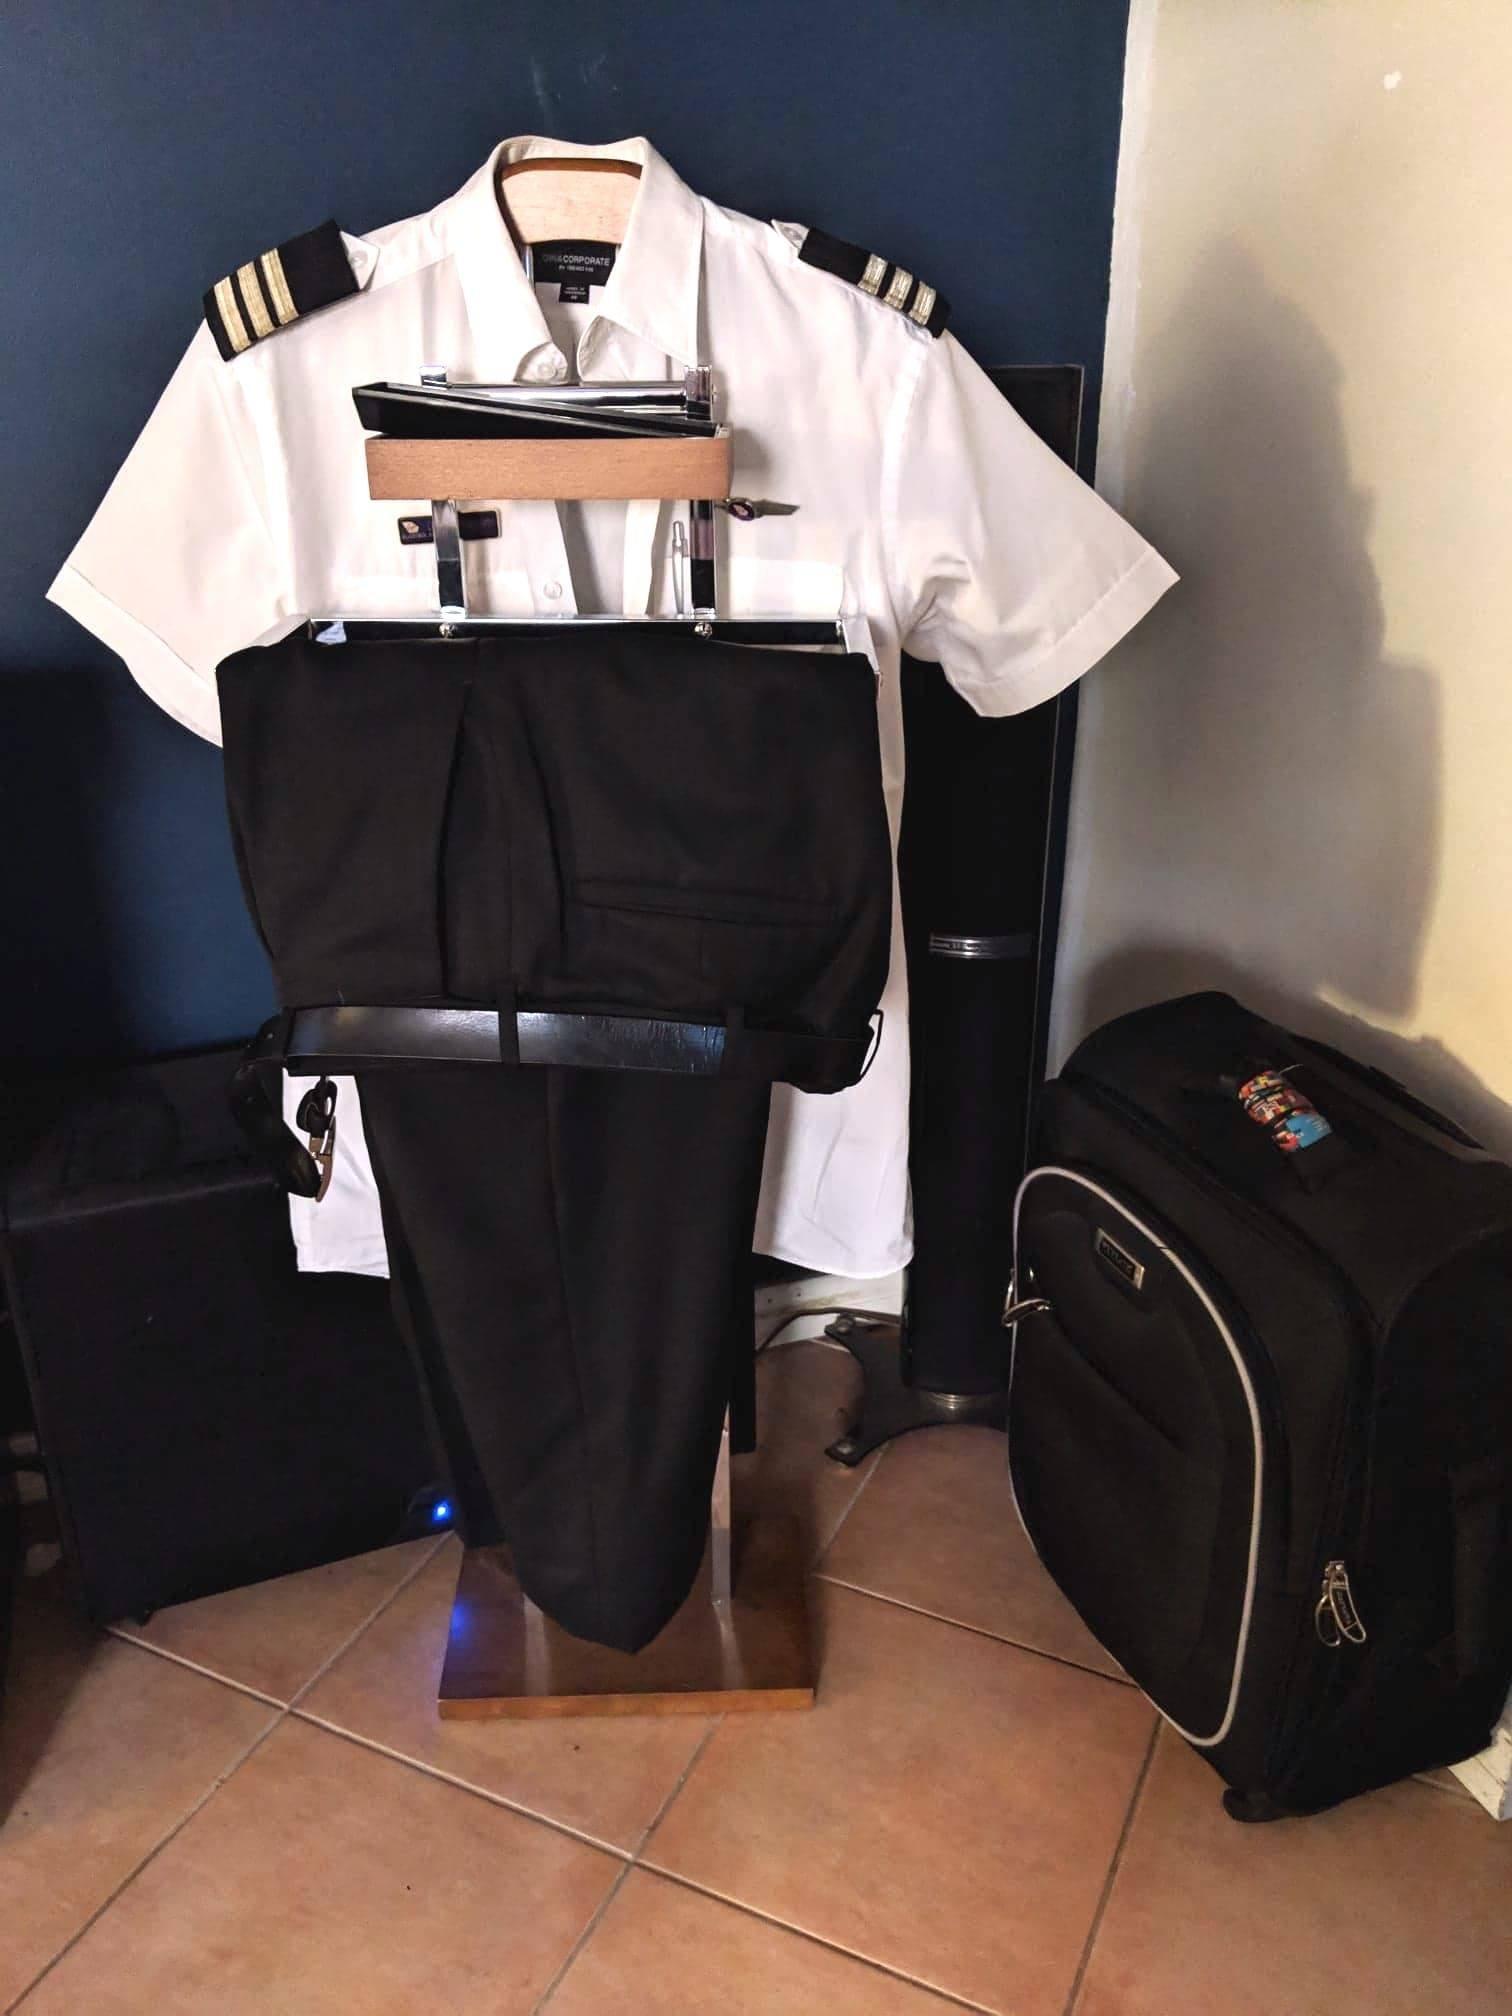 clothing valet pilot gift ideas